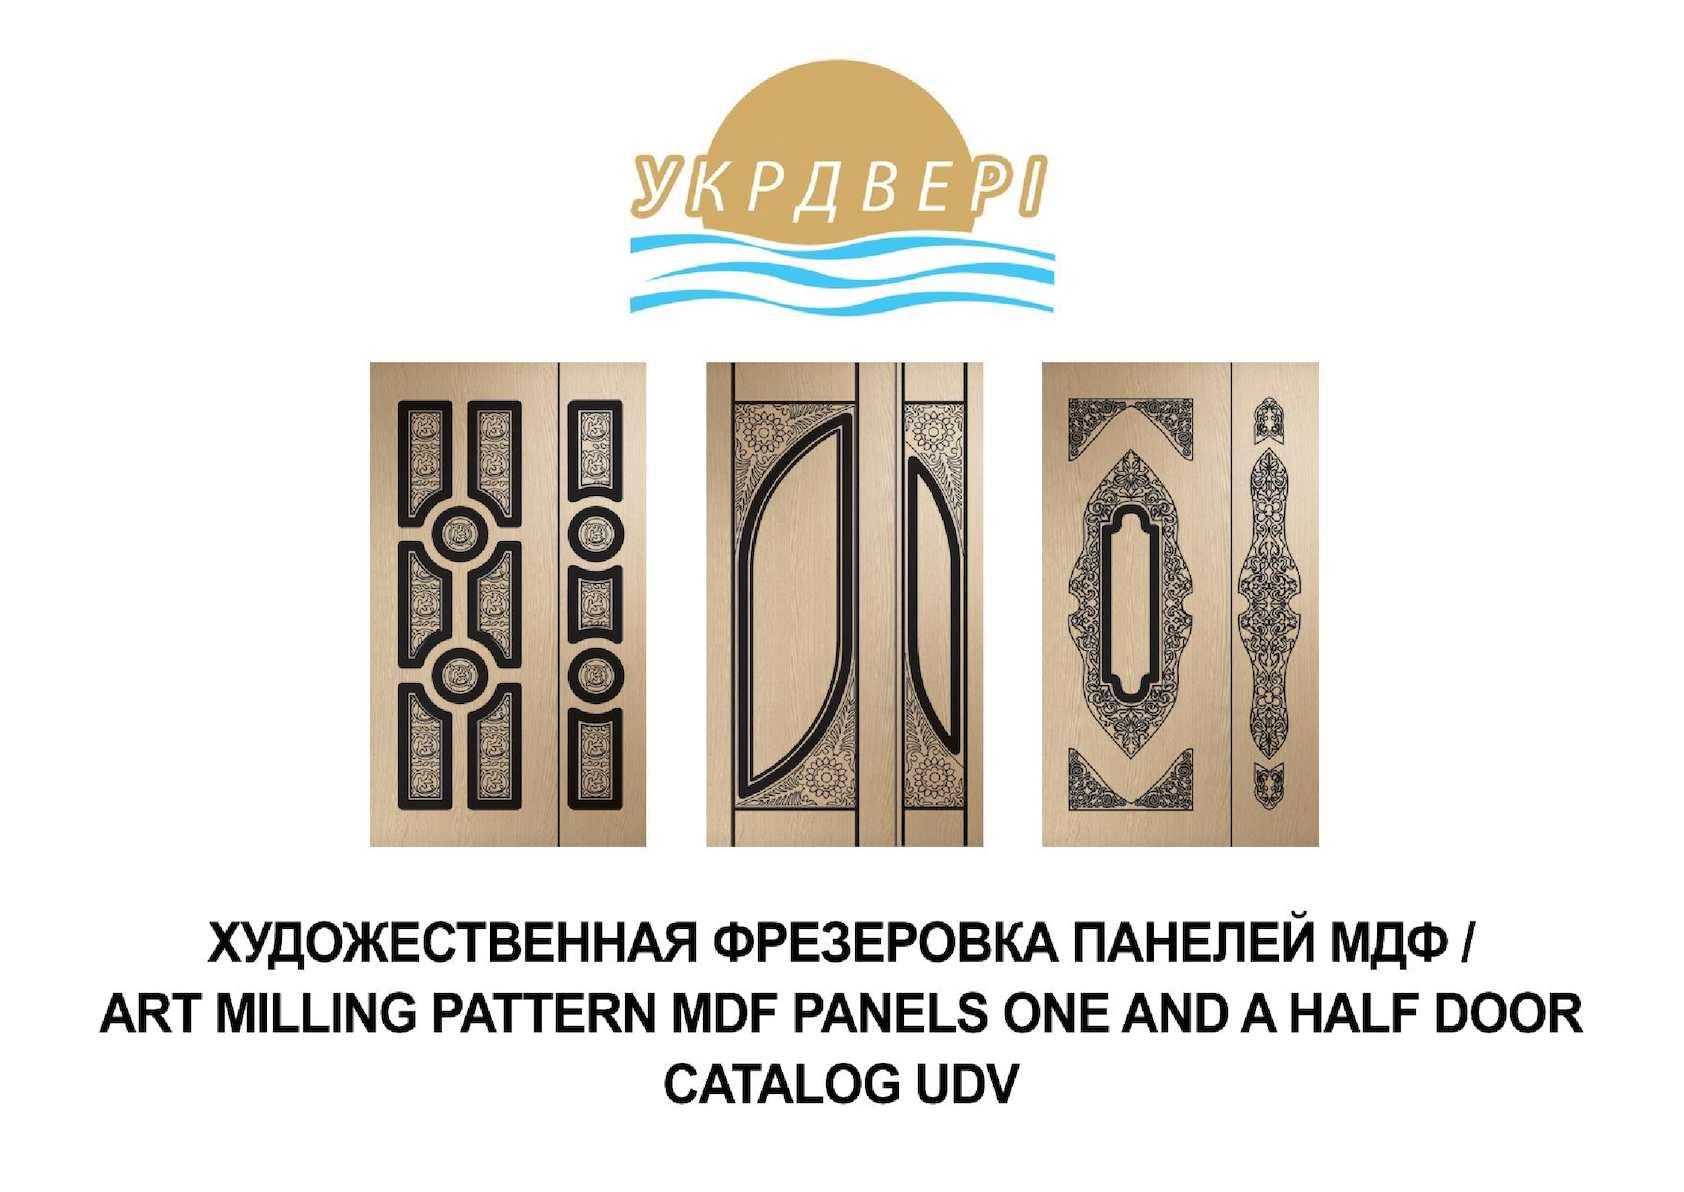 ХУДОЖЕСТВЕННАЯ ФРЕЗЕРОВКА ПАНЕЛЕЙ МДФ / ART MILLING PATTERN MDF PANELS ONE AND DOOR